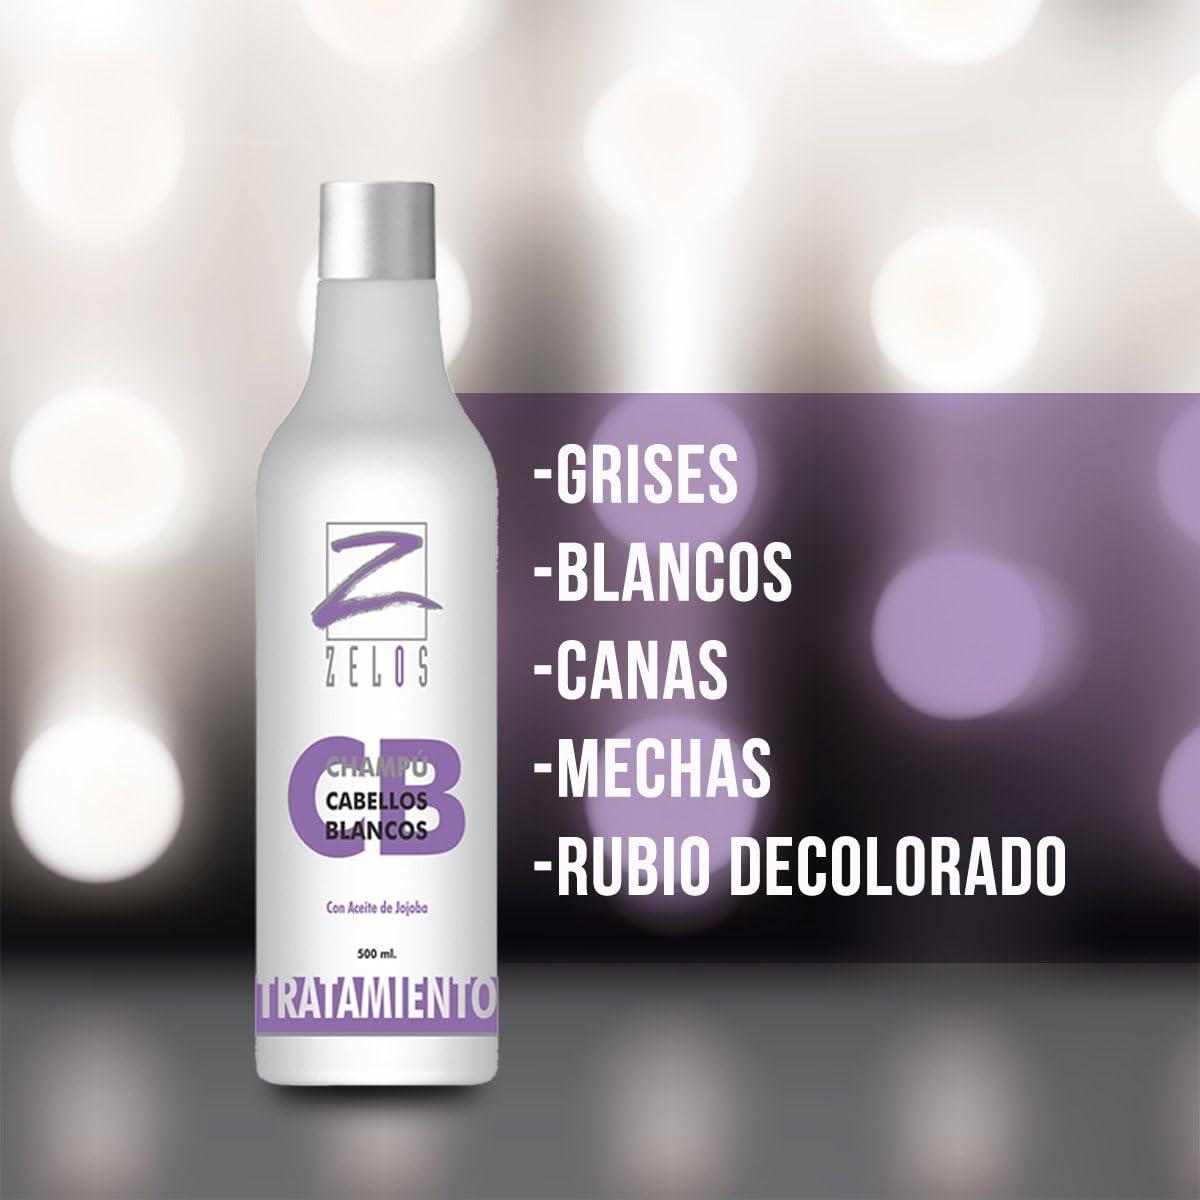 Champú Violeta 500ml - Cabellos Blancos, Grises, Decolorados ...